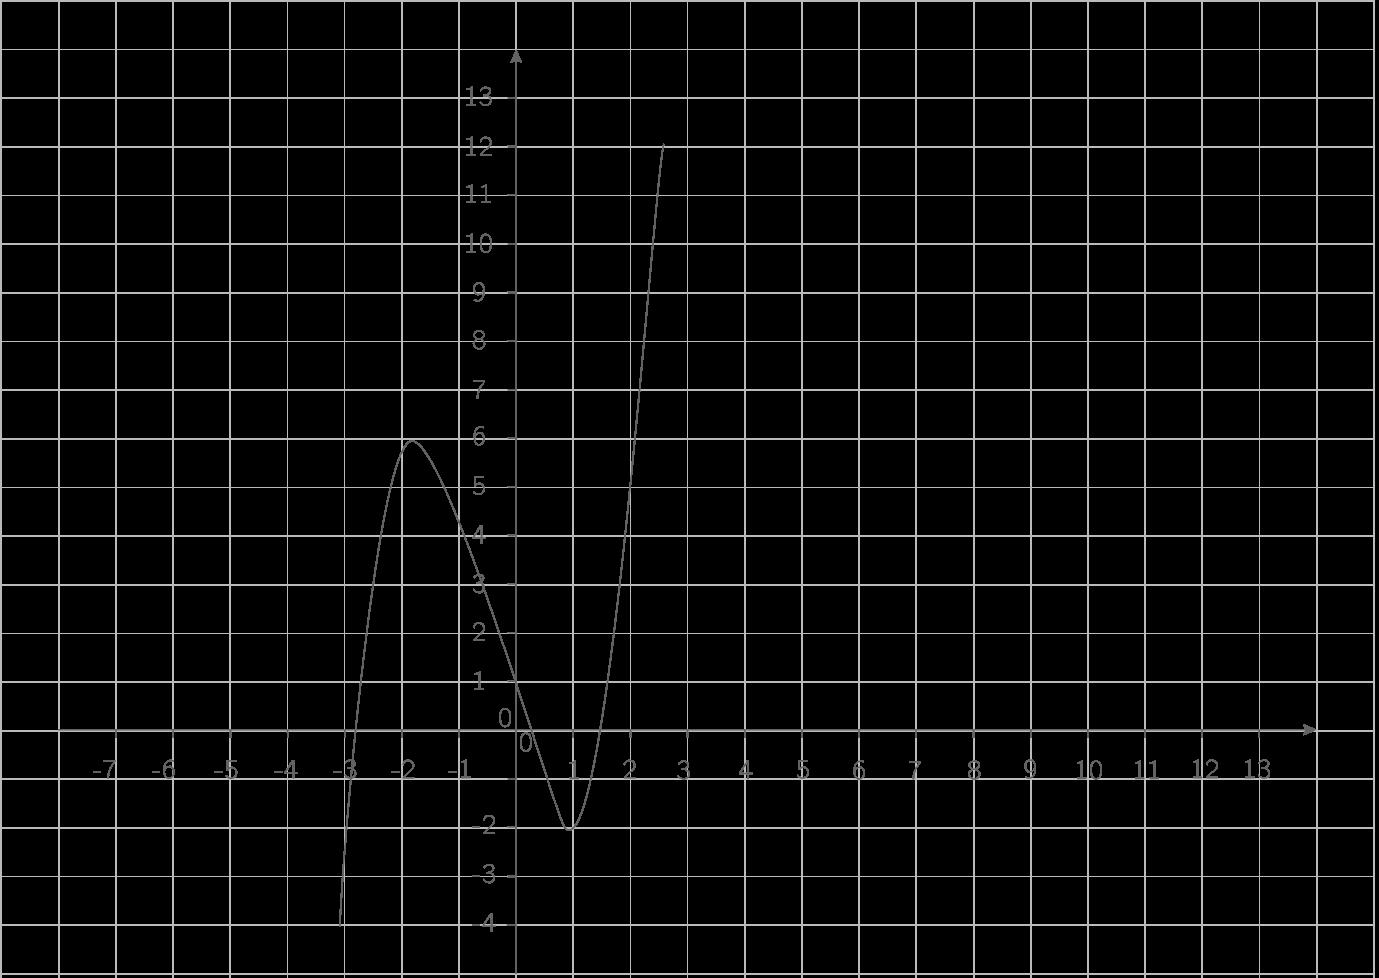 Représentation de \(\displaystyle{x\mapsto x^3+x^2-4x+1}\) :